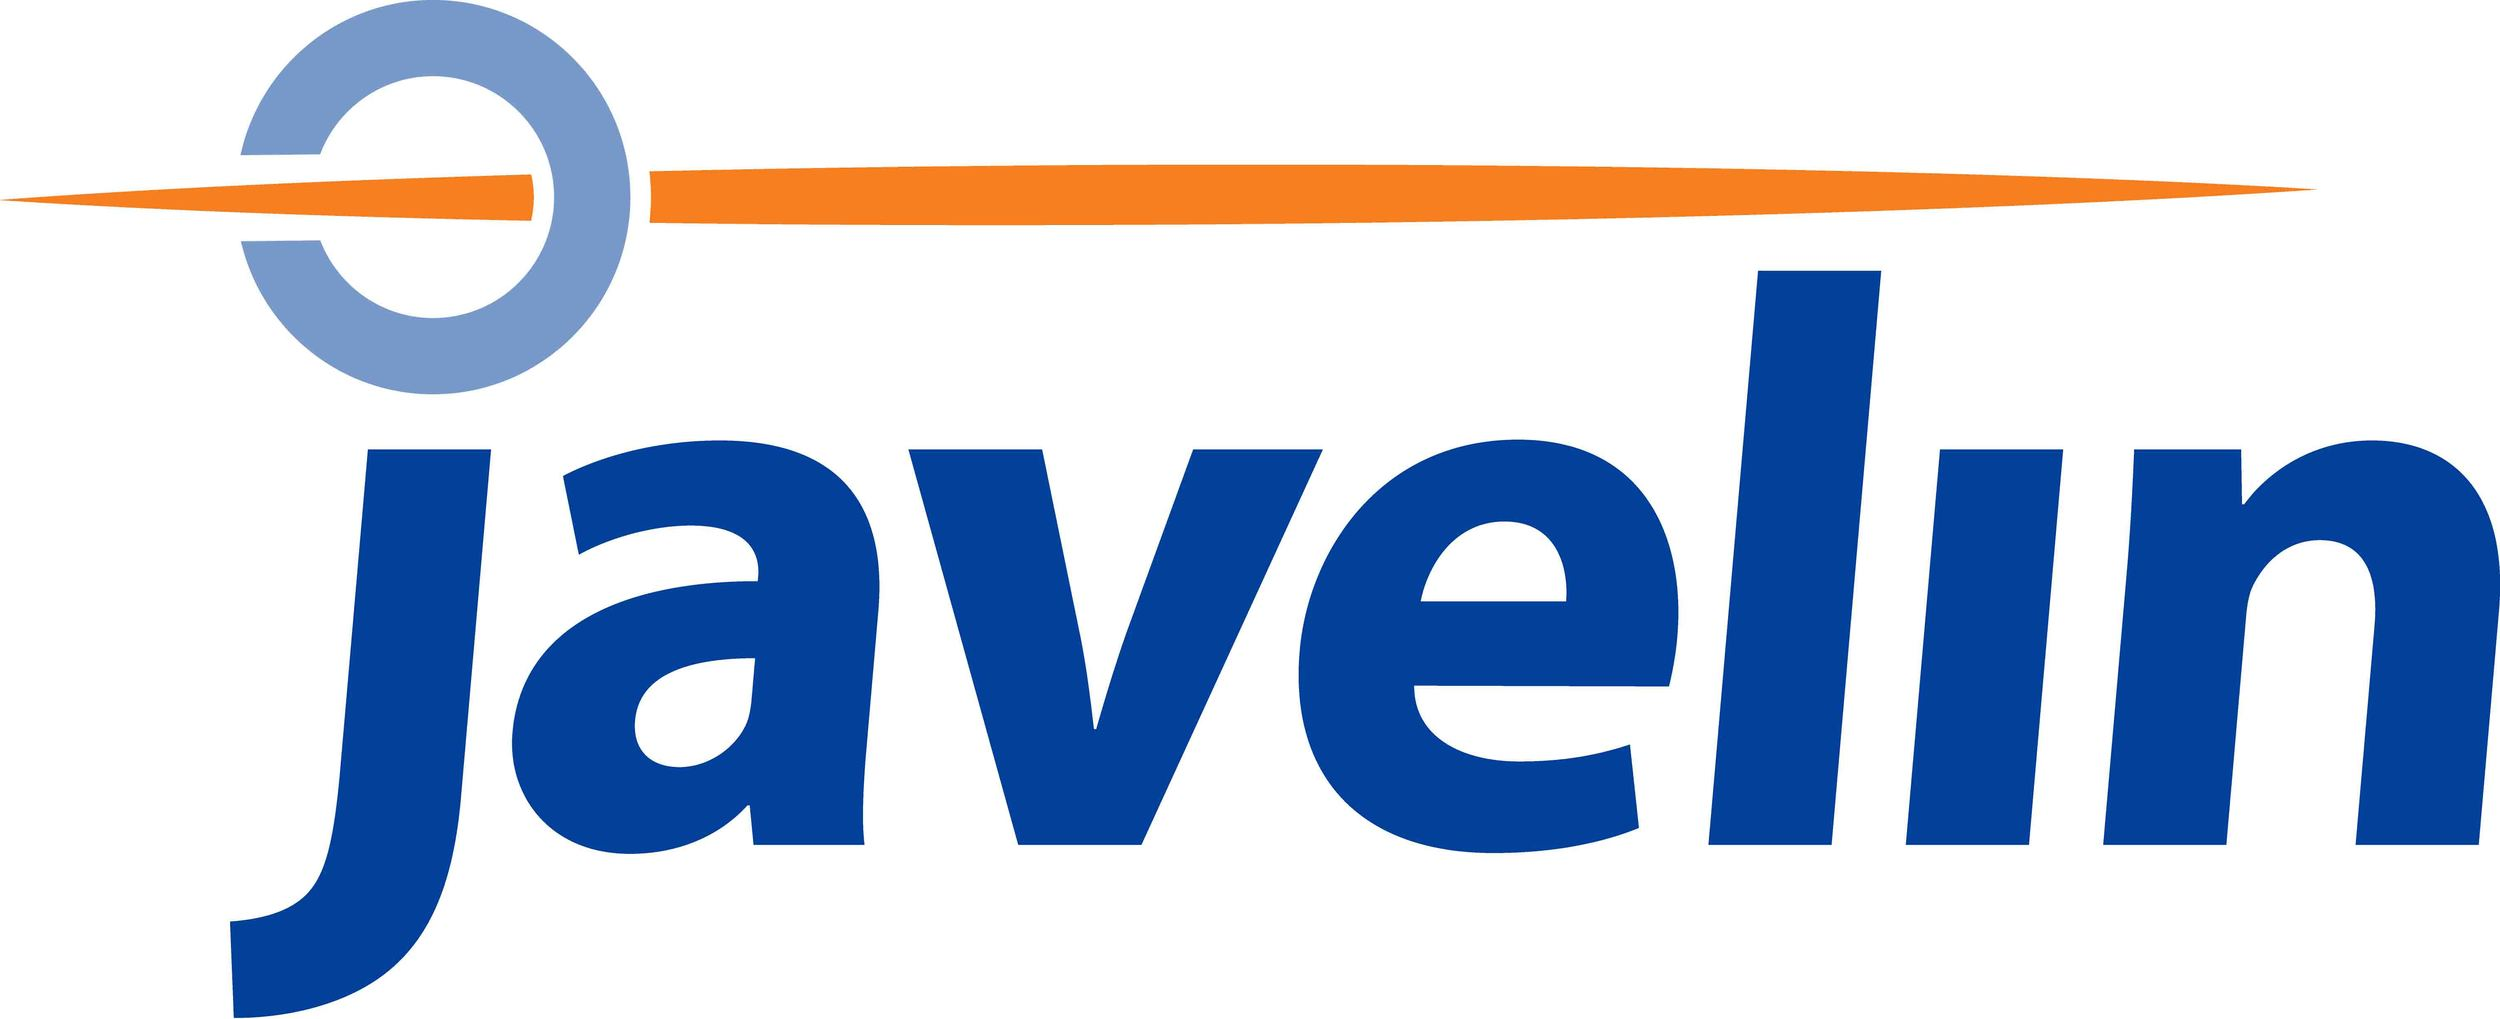 600 DPI   logo_Javelin_CLR_600dpi.jpg